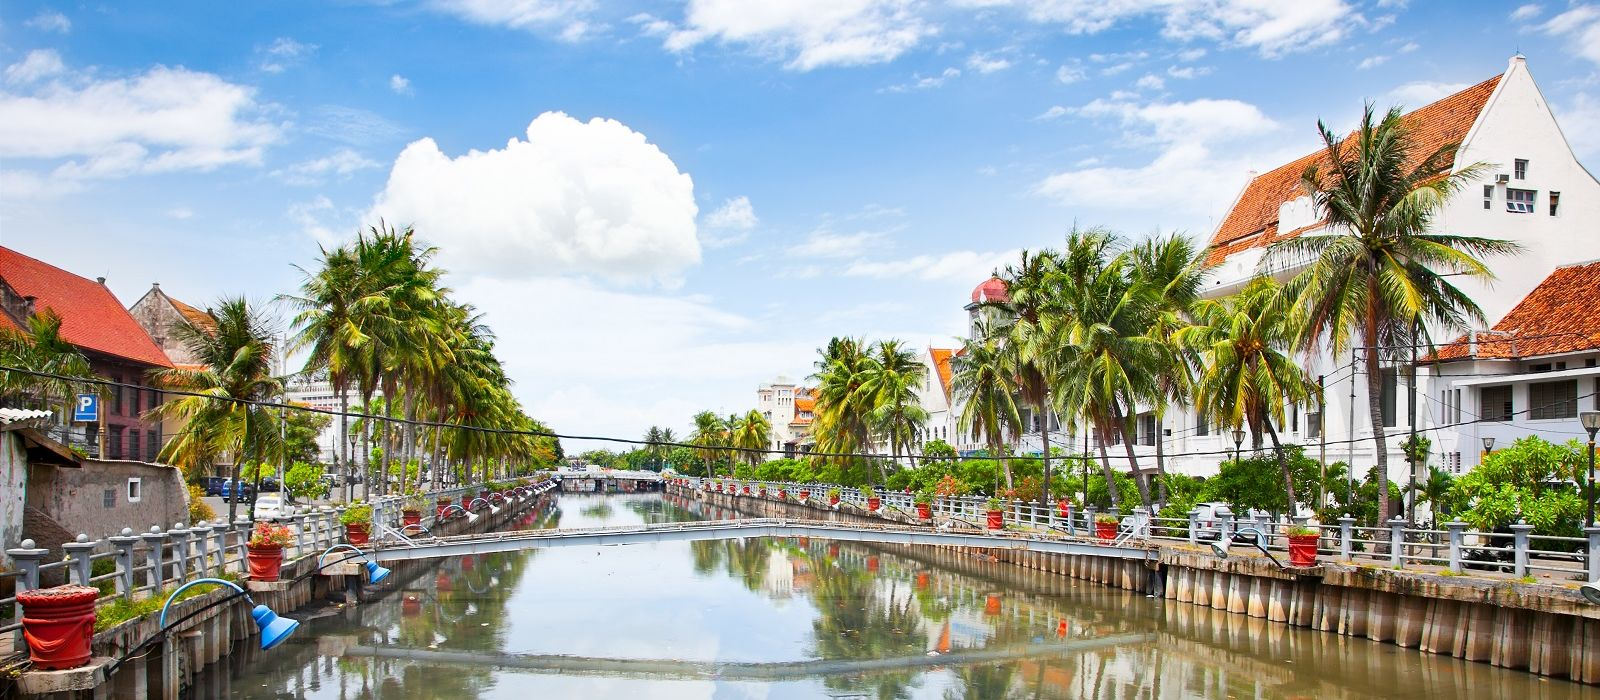 Die Klassiker auf Sumatra und Java Urlaub 2